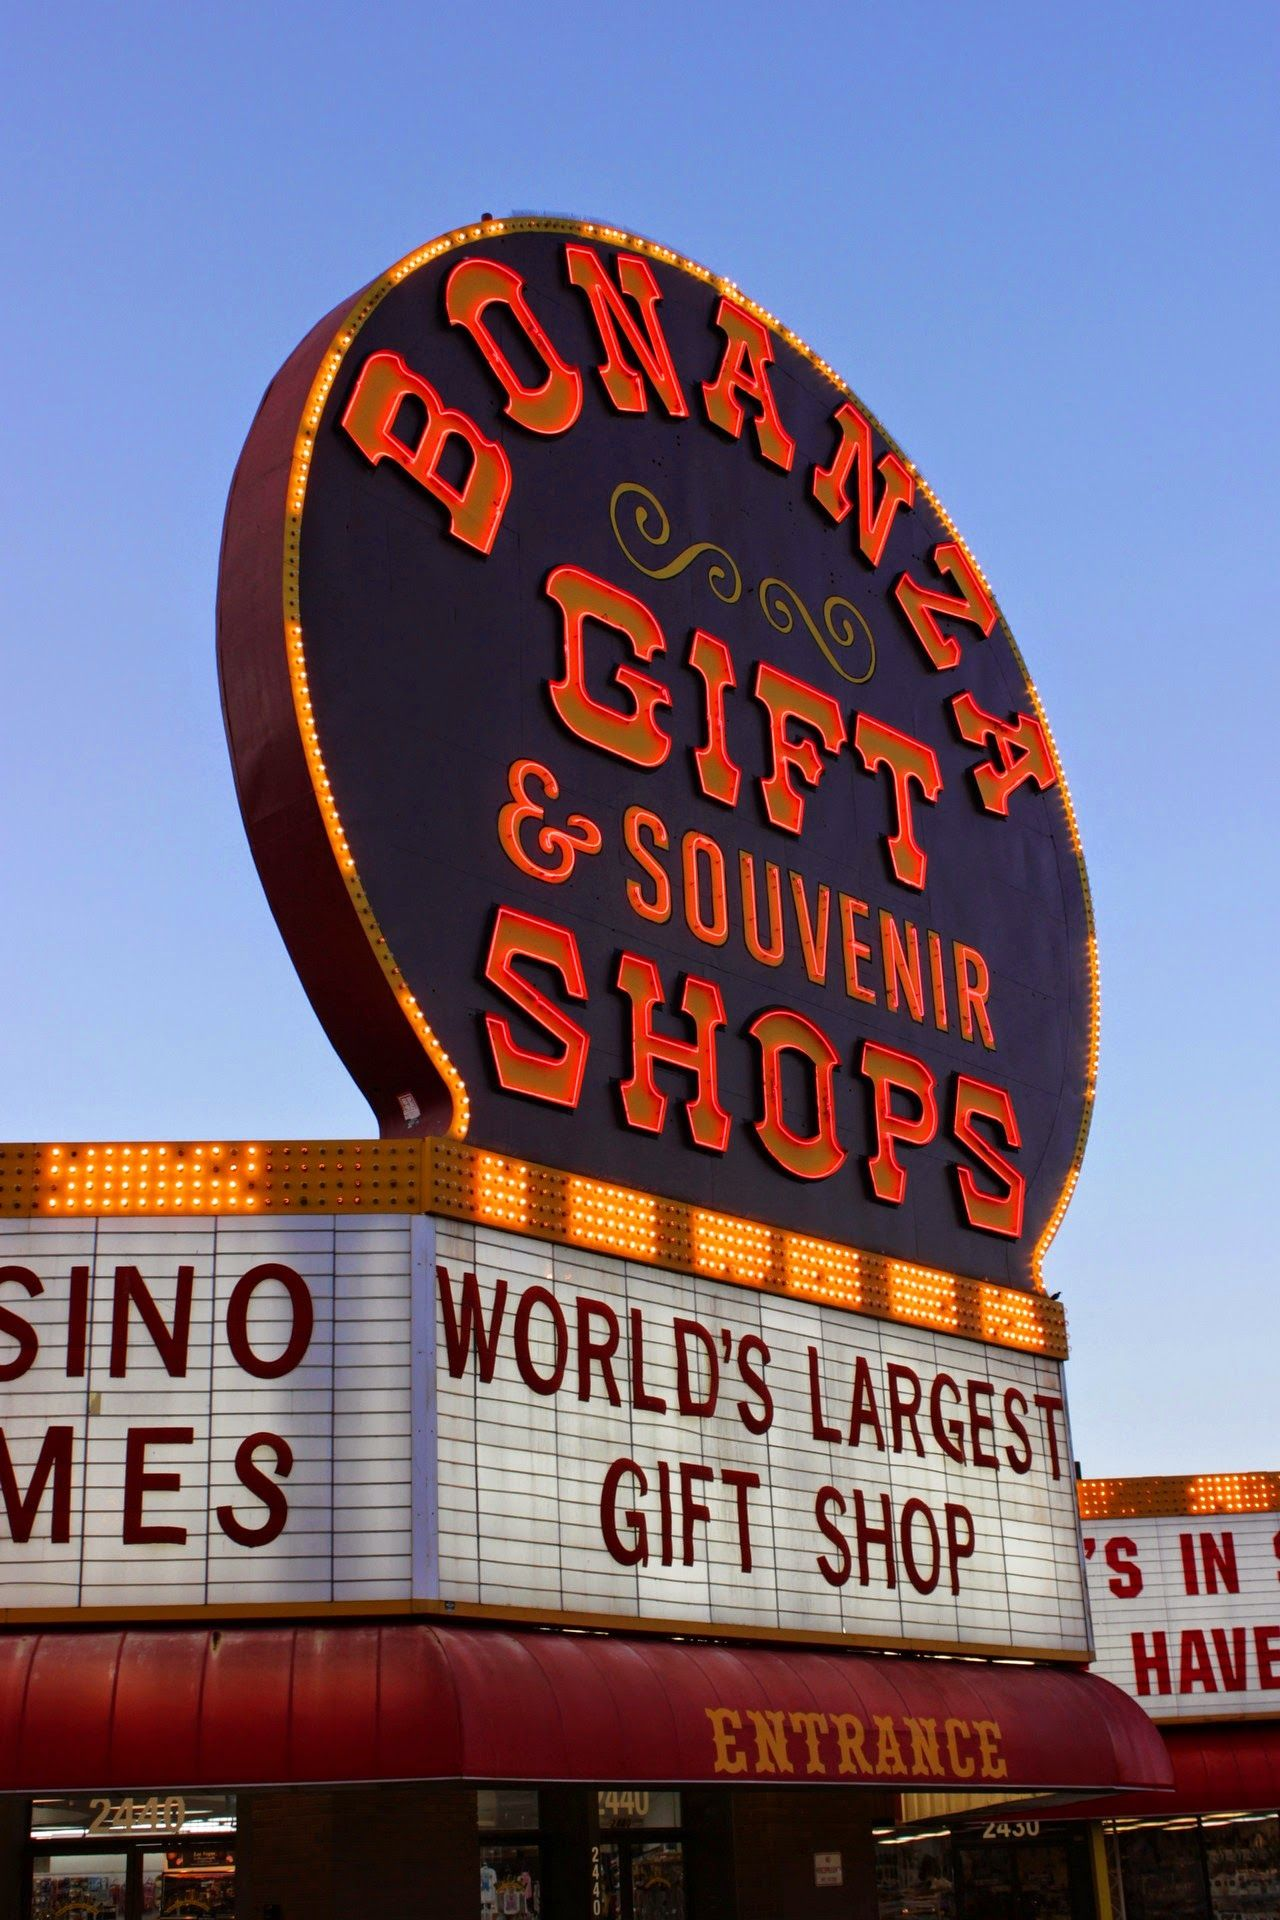 ... desde Bonanza Gift Shops